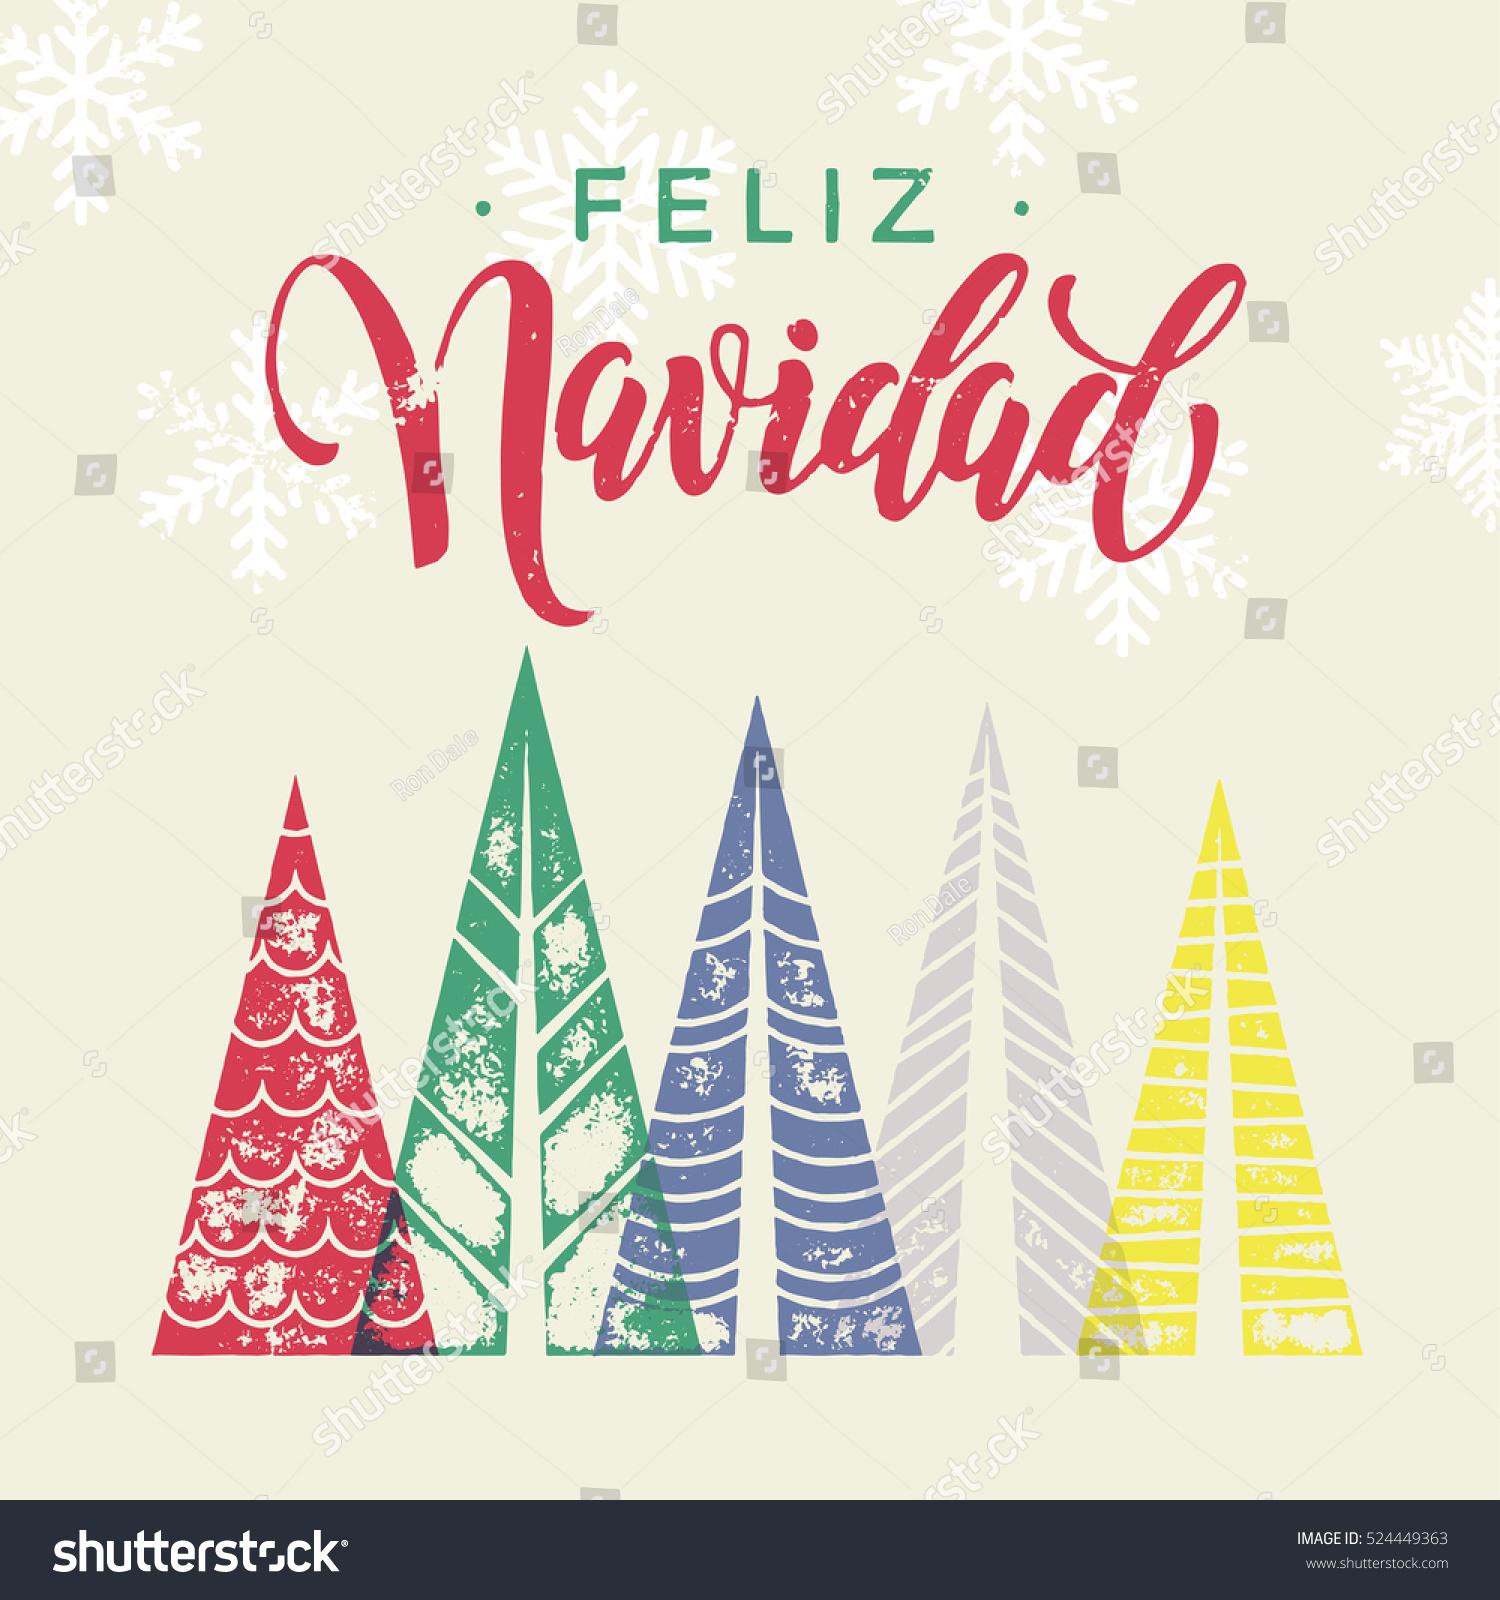 Spanish Winter Holidays Greeting Card Text Stock Photo Photo